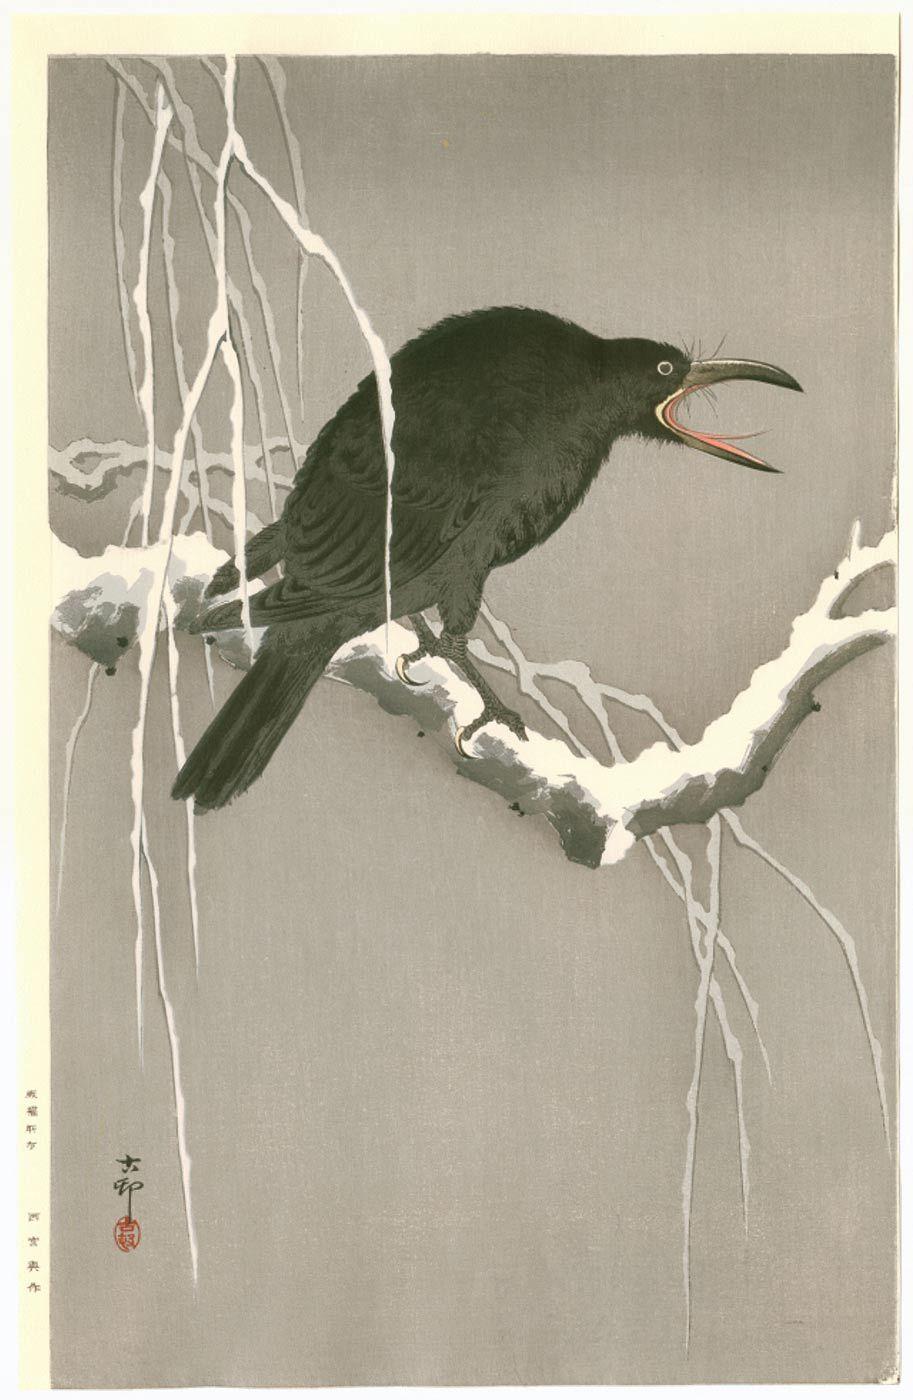 Ohara Koson: Screaming Crow | Artist: Ohara Koson (Shoson) | Ohara